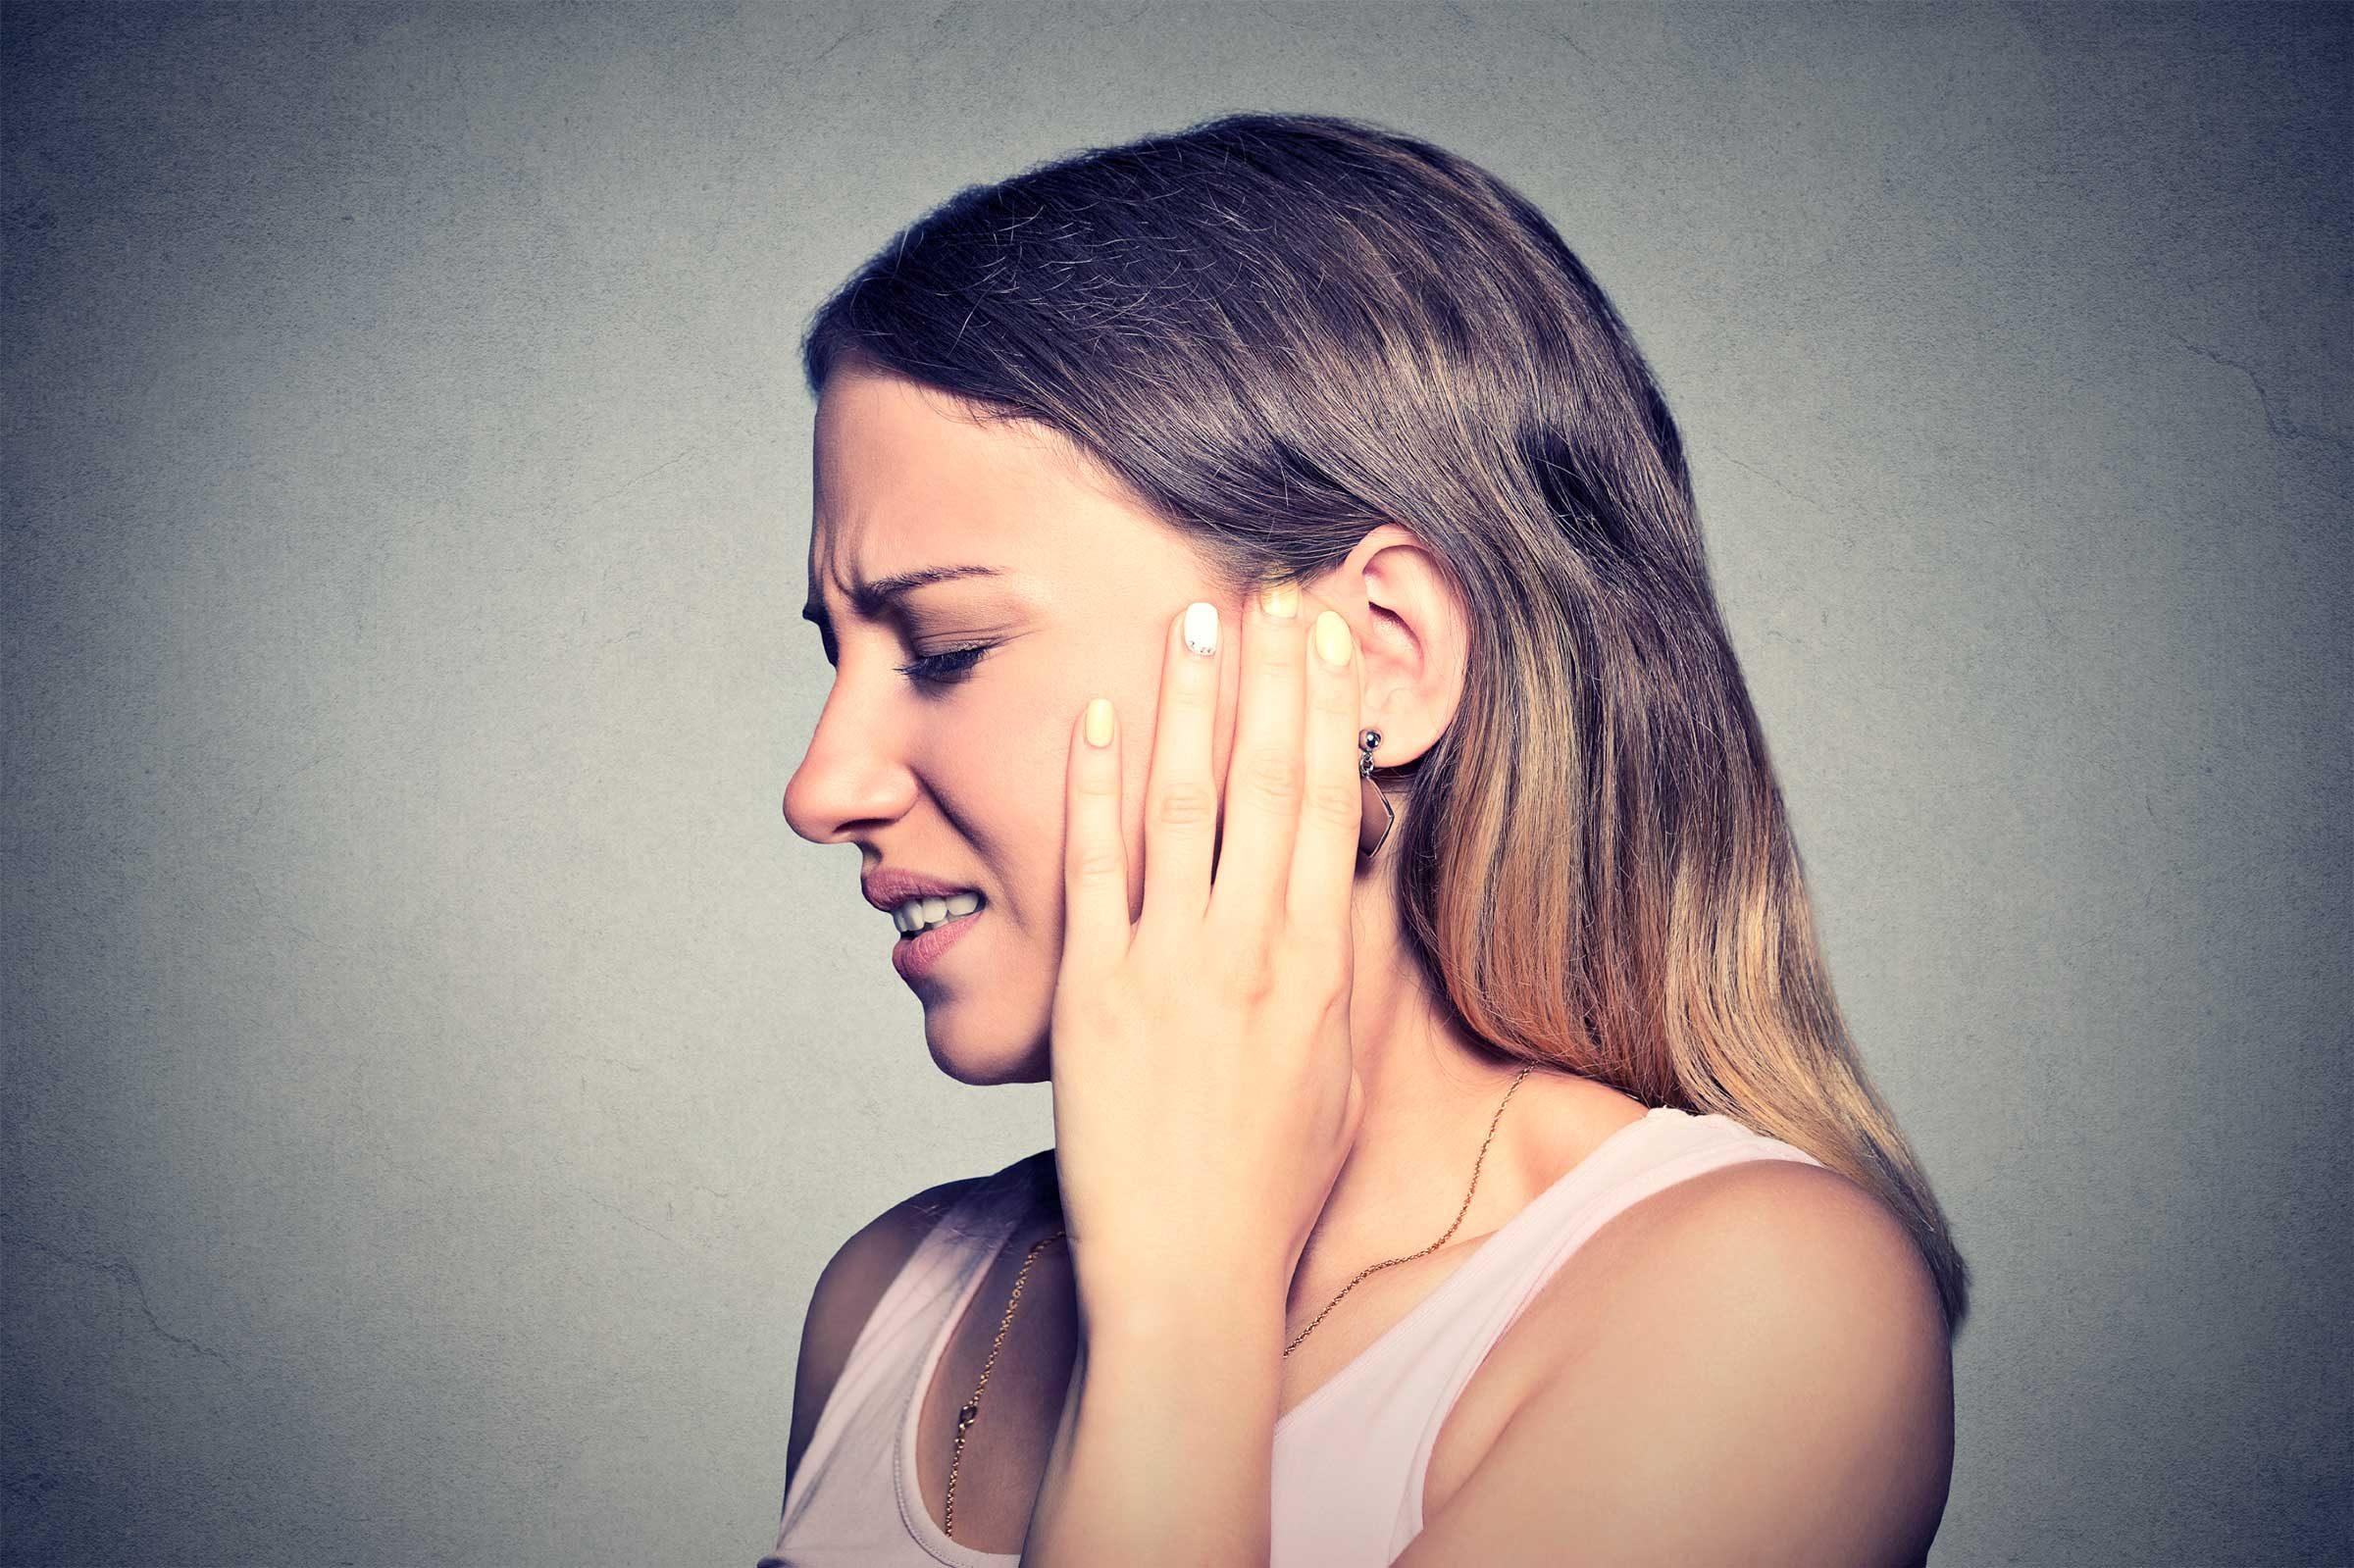 Acid Reflux Symptoms: 6 Silent GERD Signs | Reader's Digest